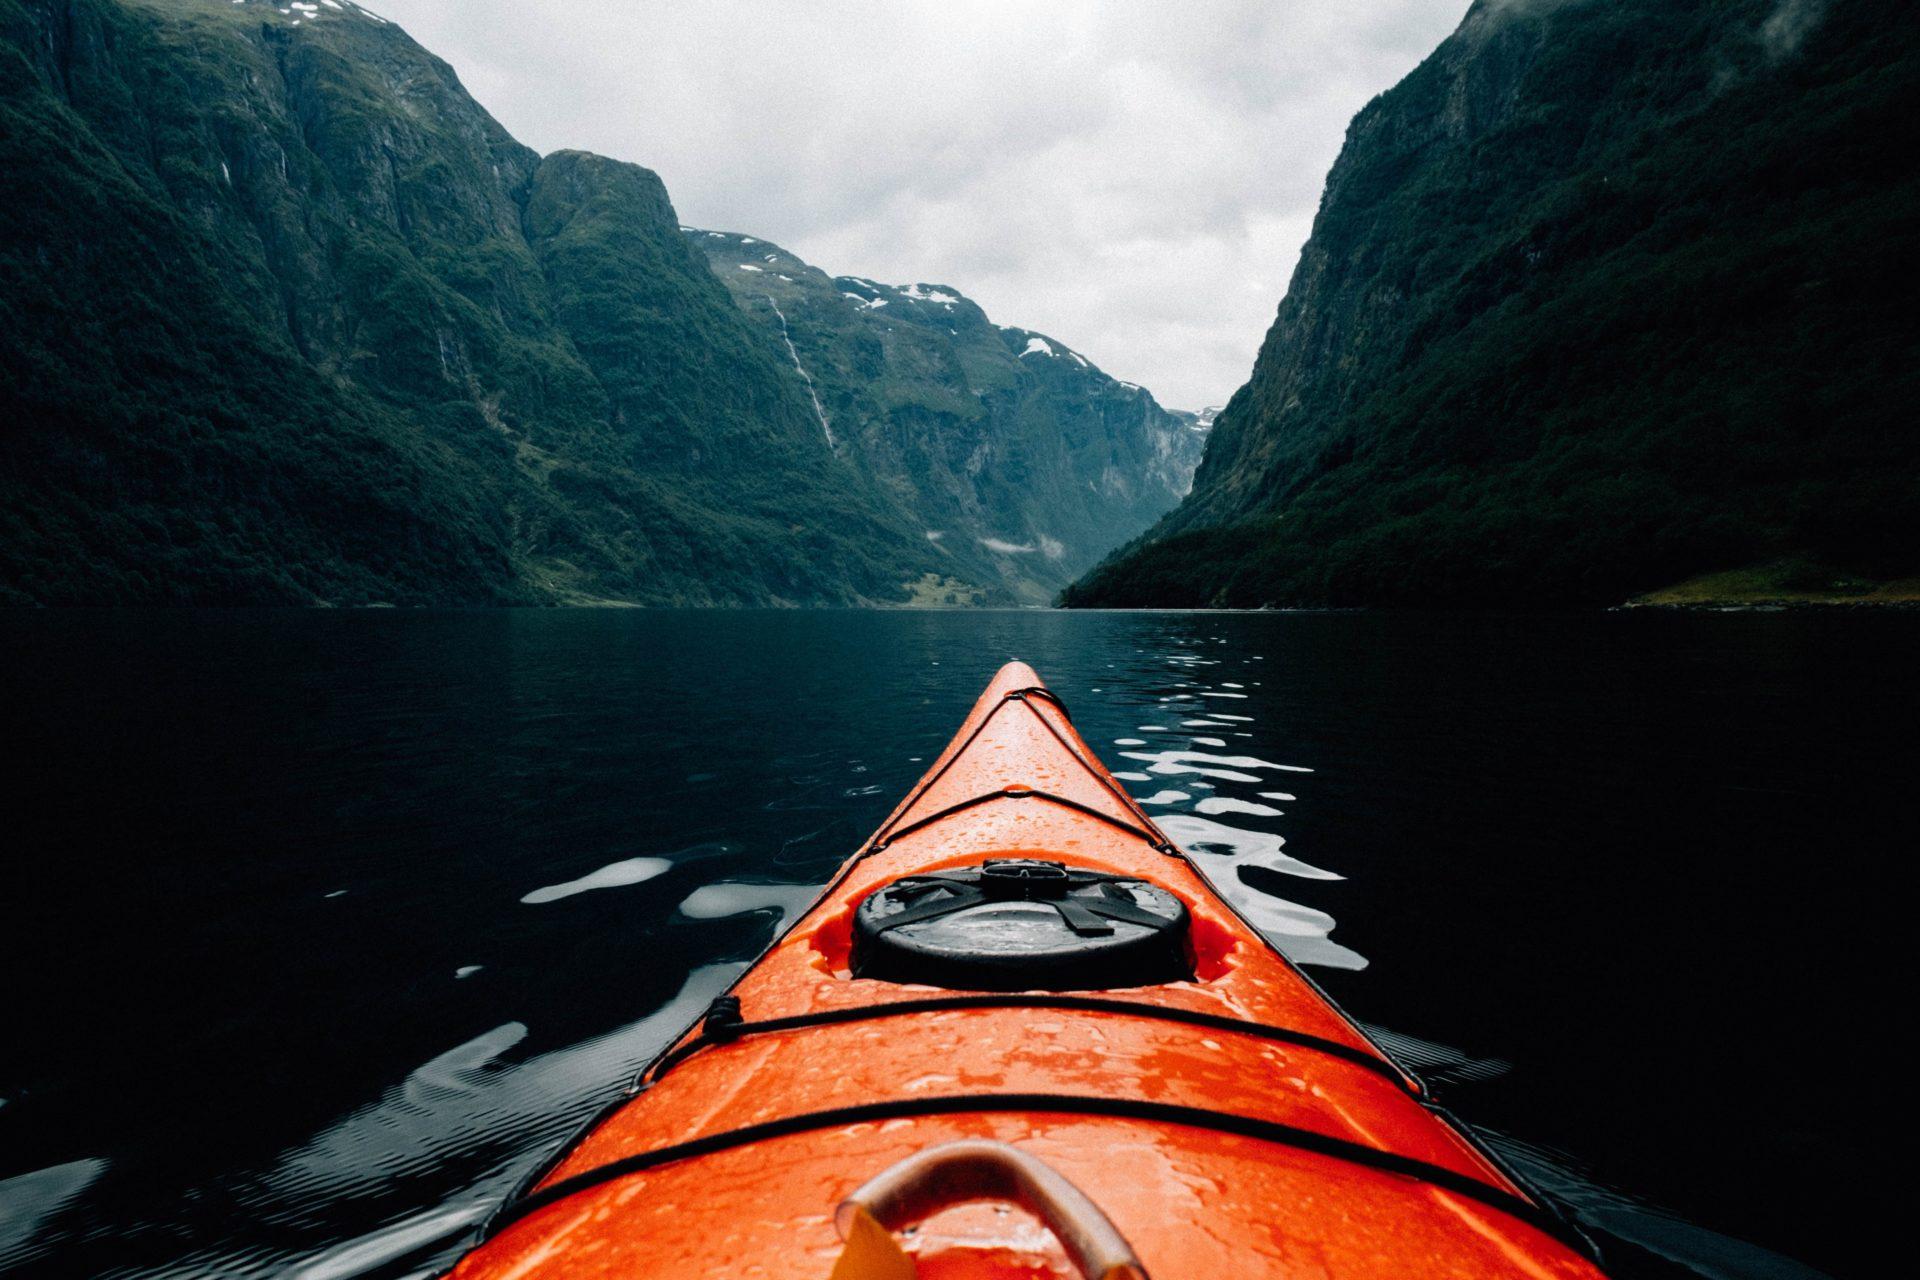 Kayak on the Open Water